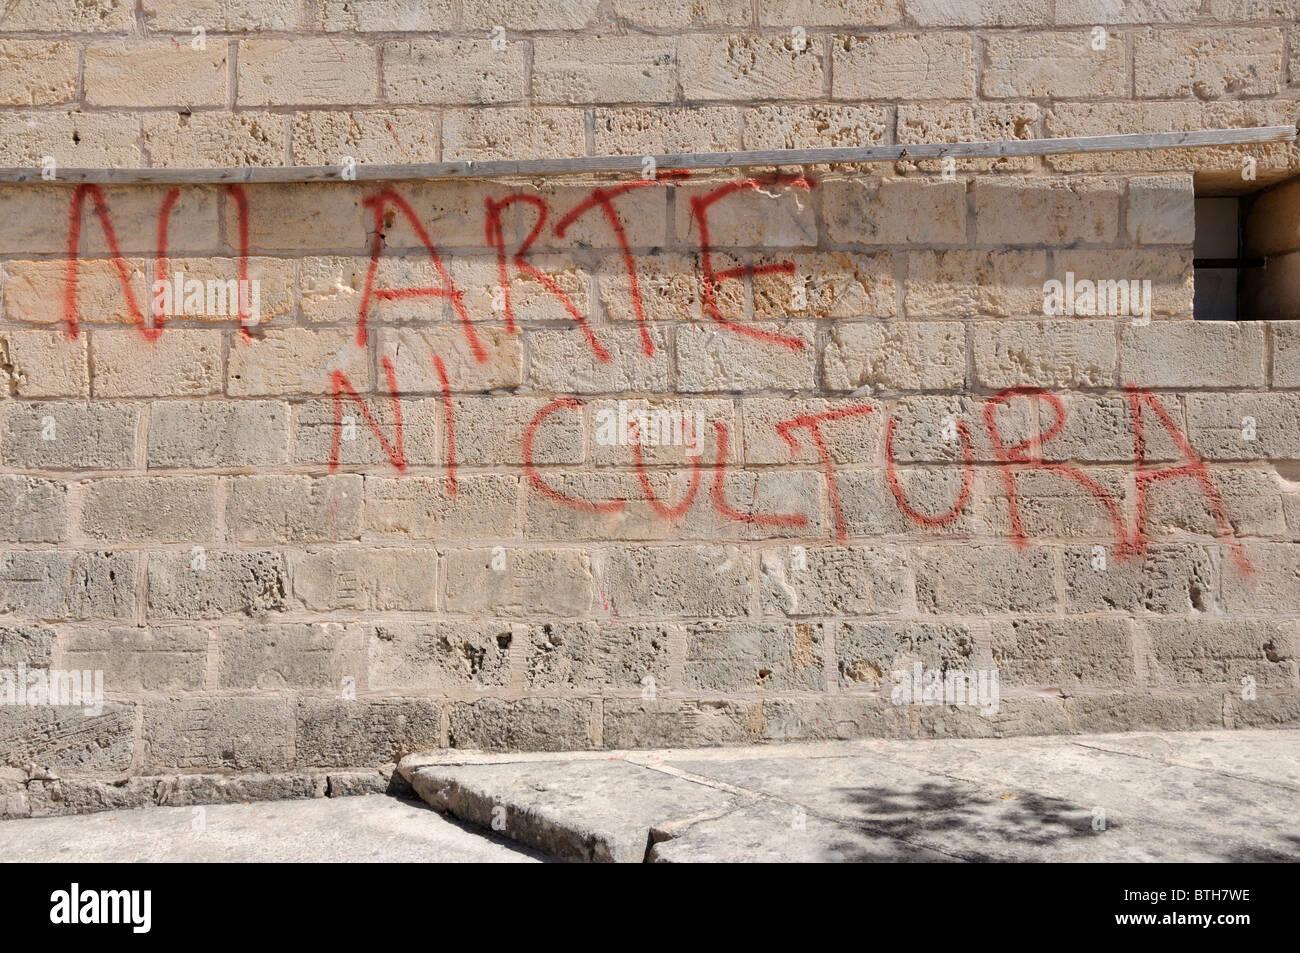 Graffiti protest on the walls of the bull ring, Alcudia, Majorca - Stock Image